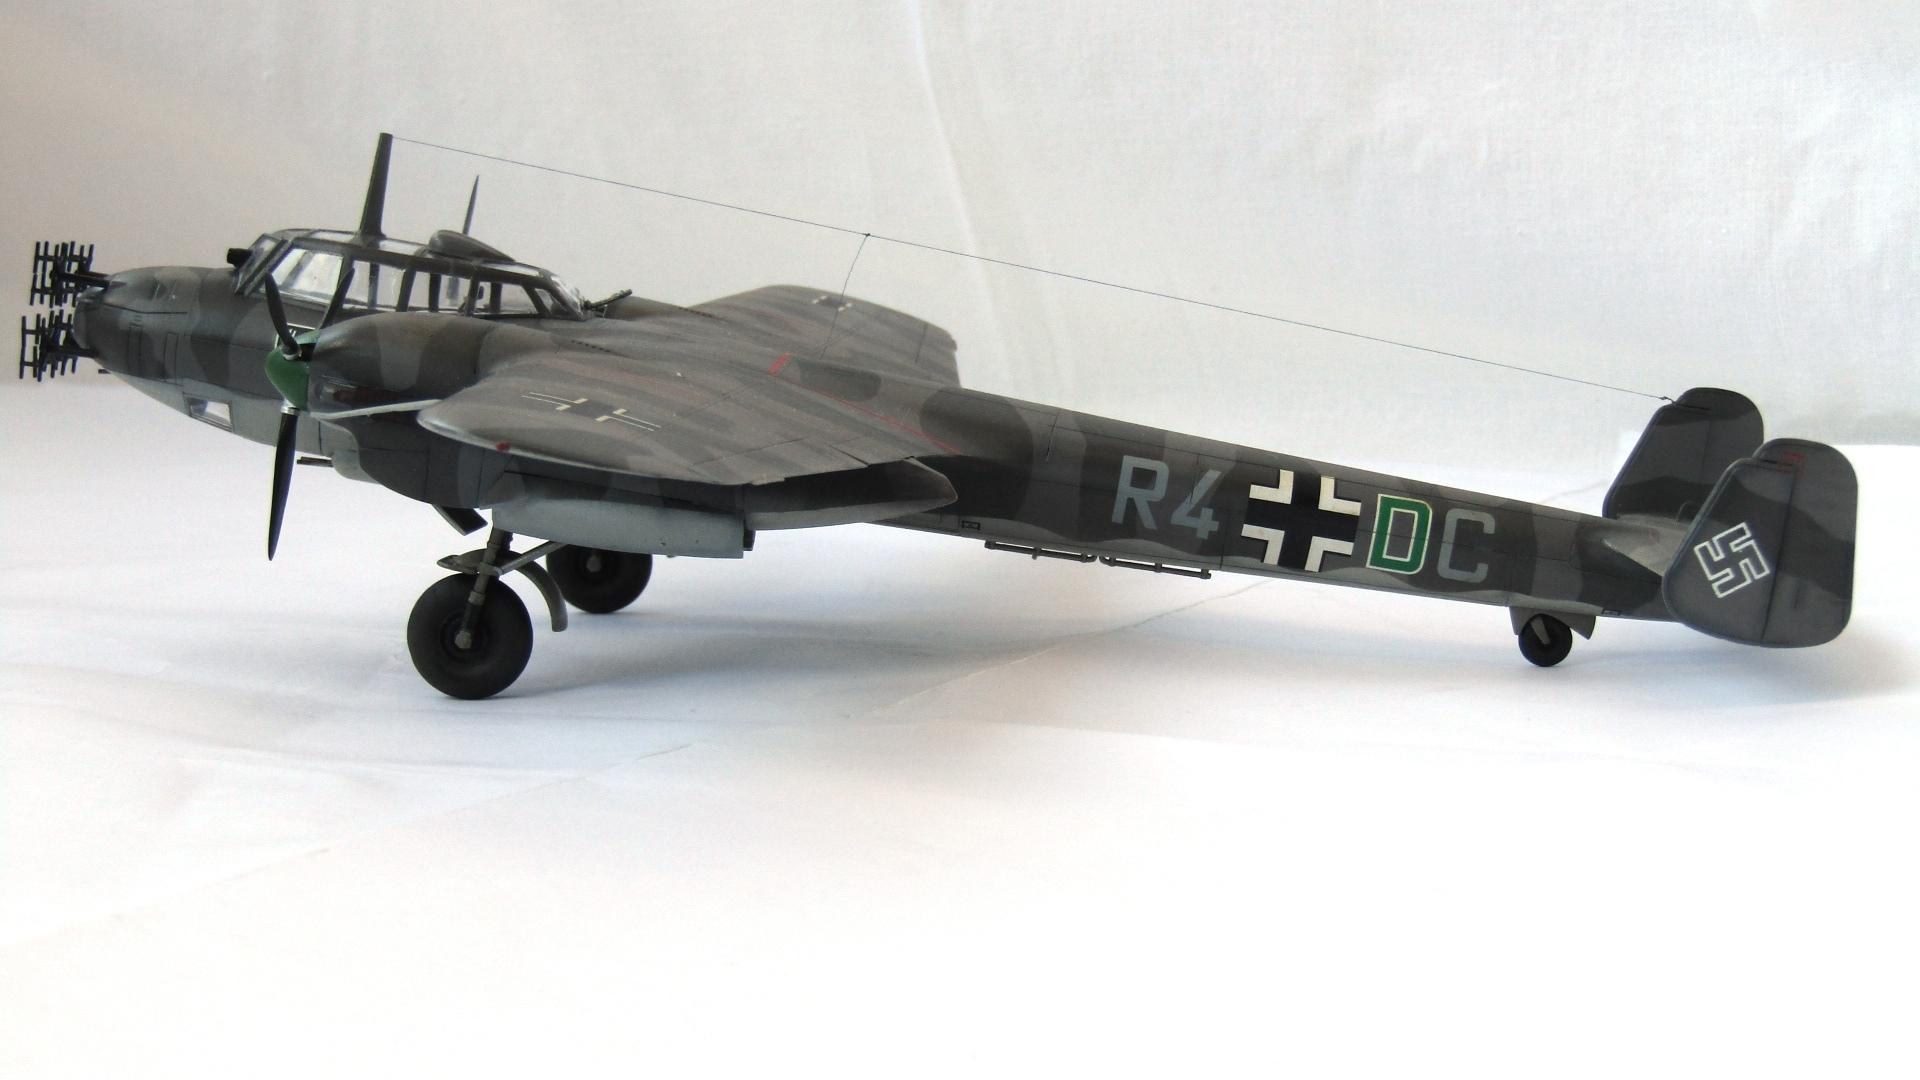 Do-215 B-5 1/72 (ICM) _jI53F7JuXY